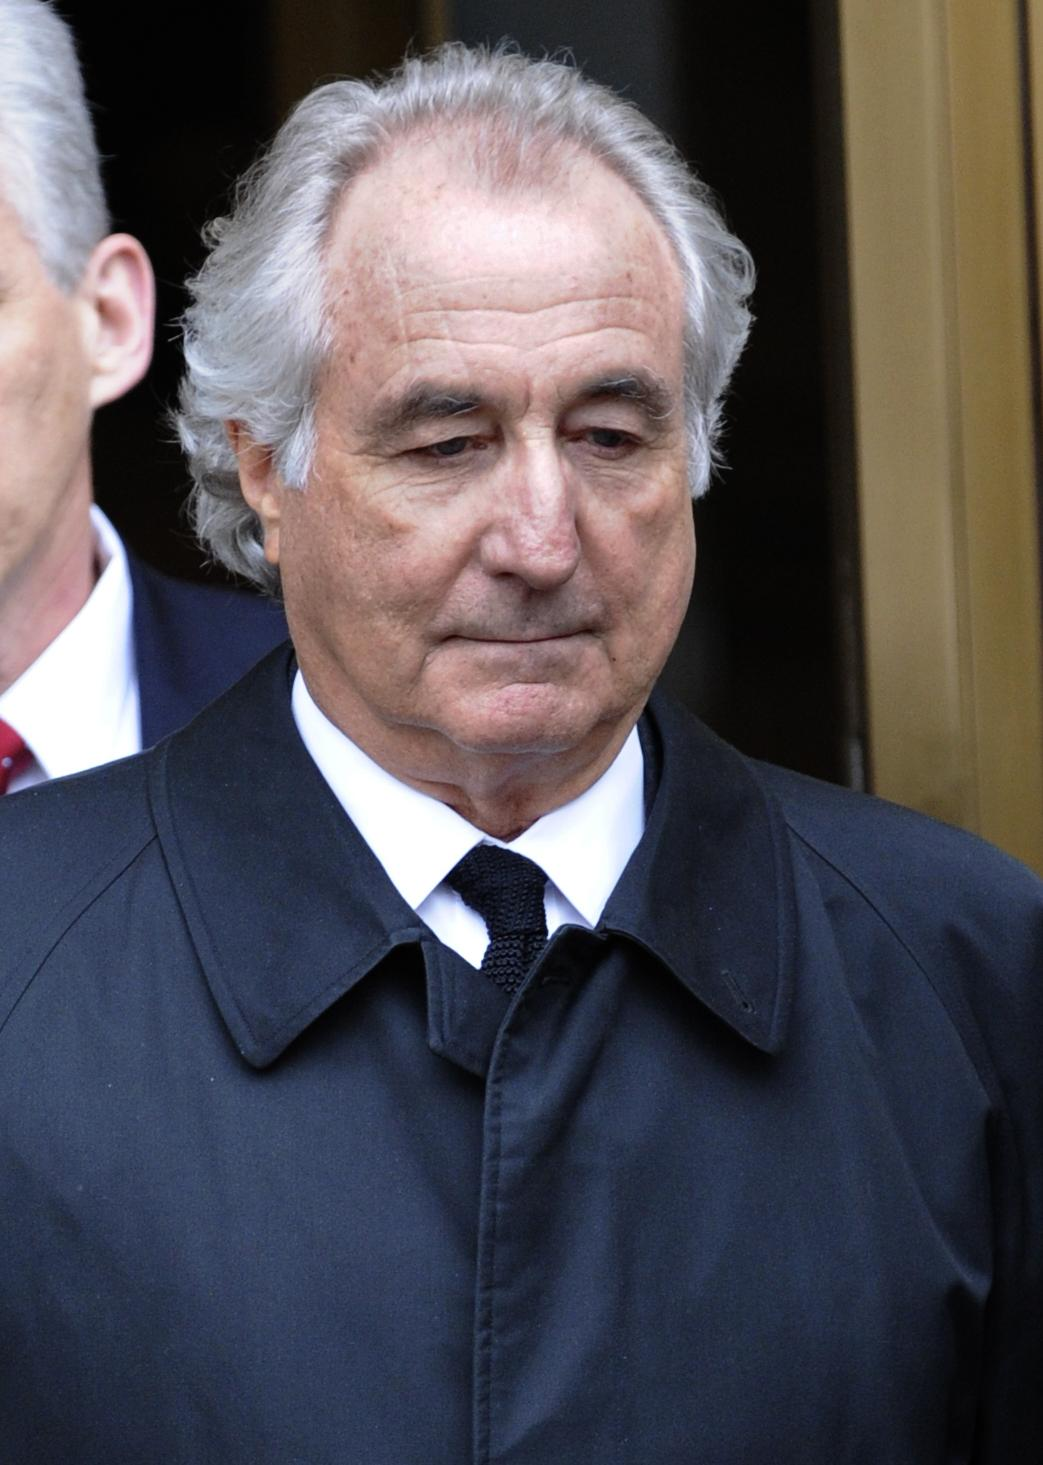 SEC Charges Bernard L. Madoff for Multi-Billion Dollar Ponzi Scheme